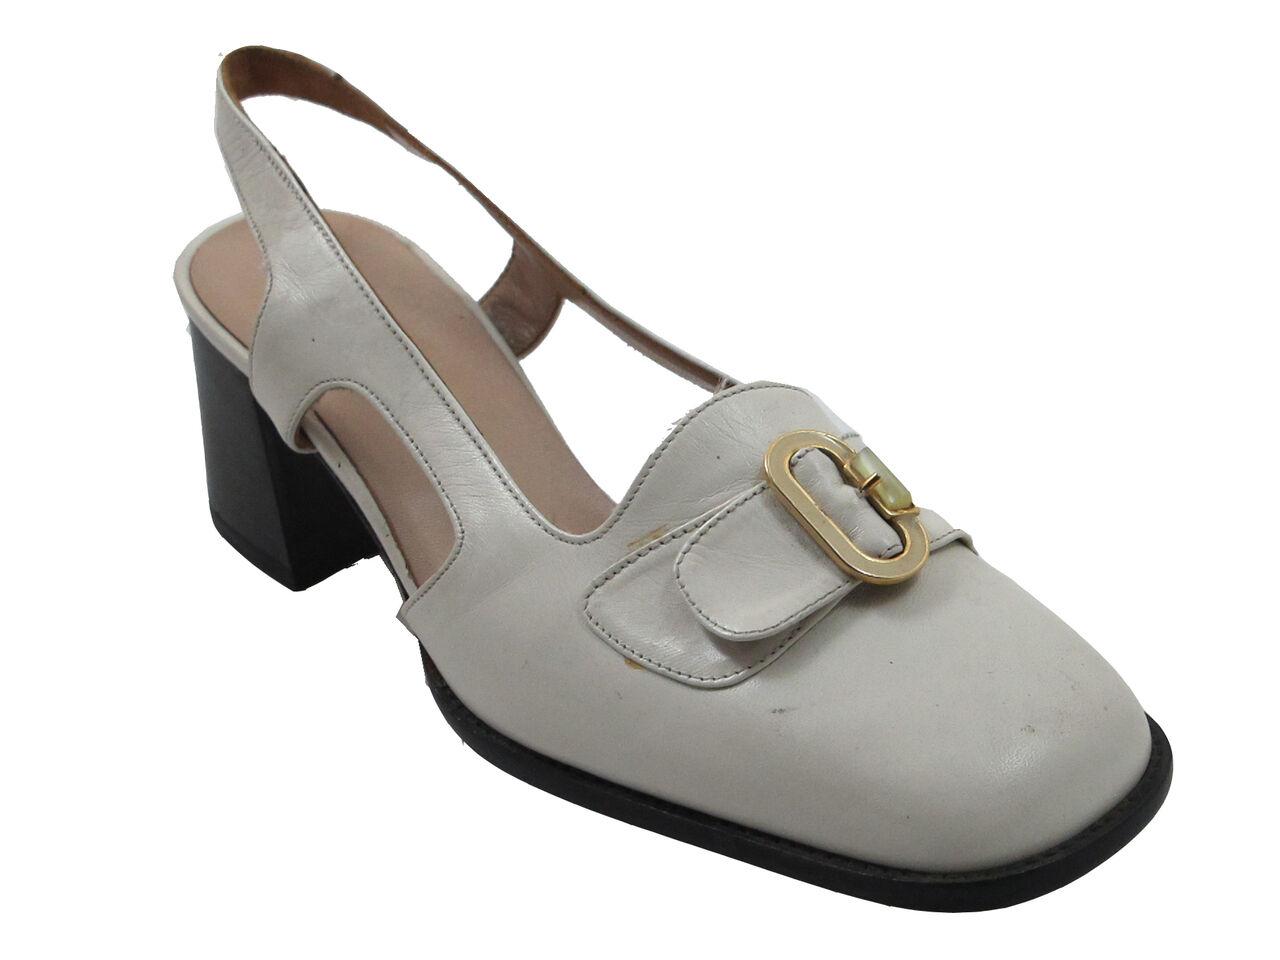 DA'VINCI 255 Women's Italian Casual Low Heel Closed Toe Sling Back Sandal